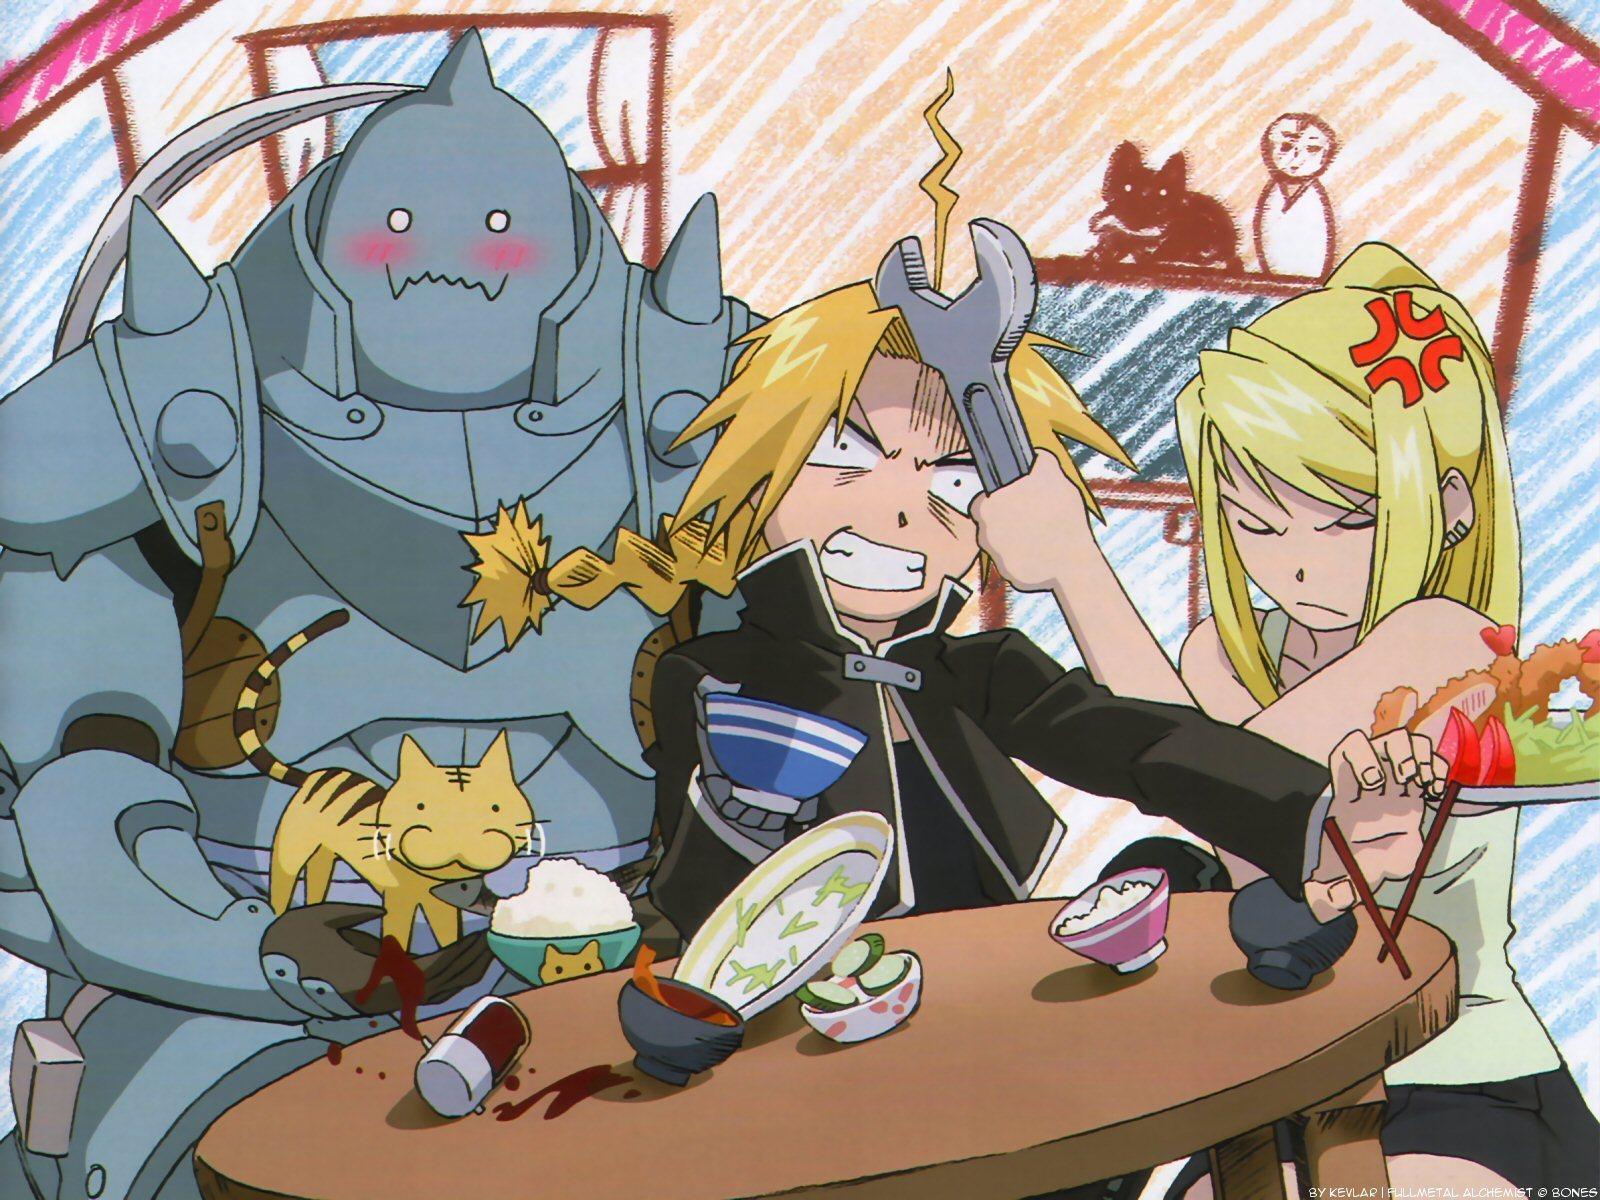 Fullmetal Alchemist Manga Images Wallpaper HD And Background Photos